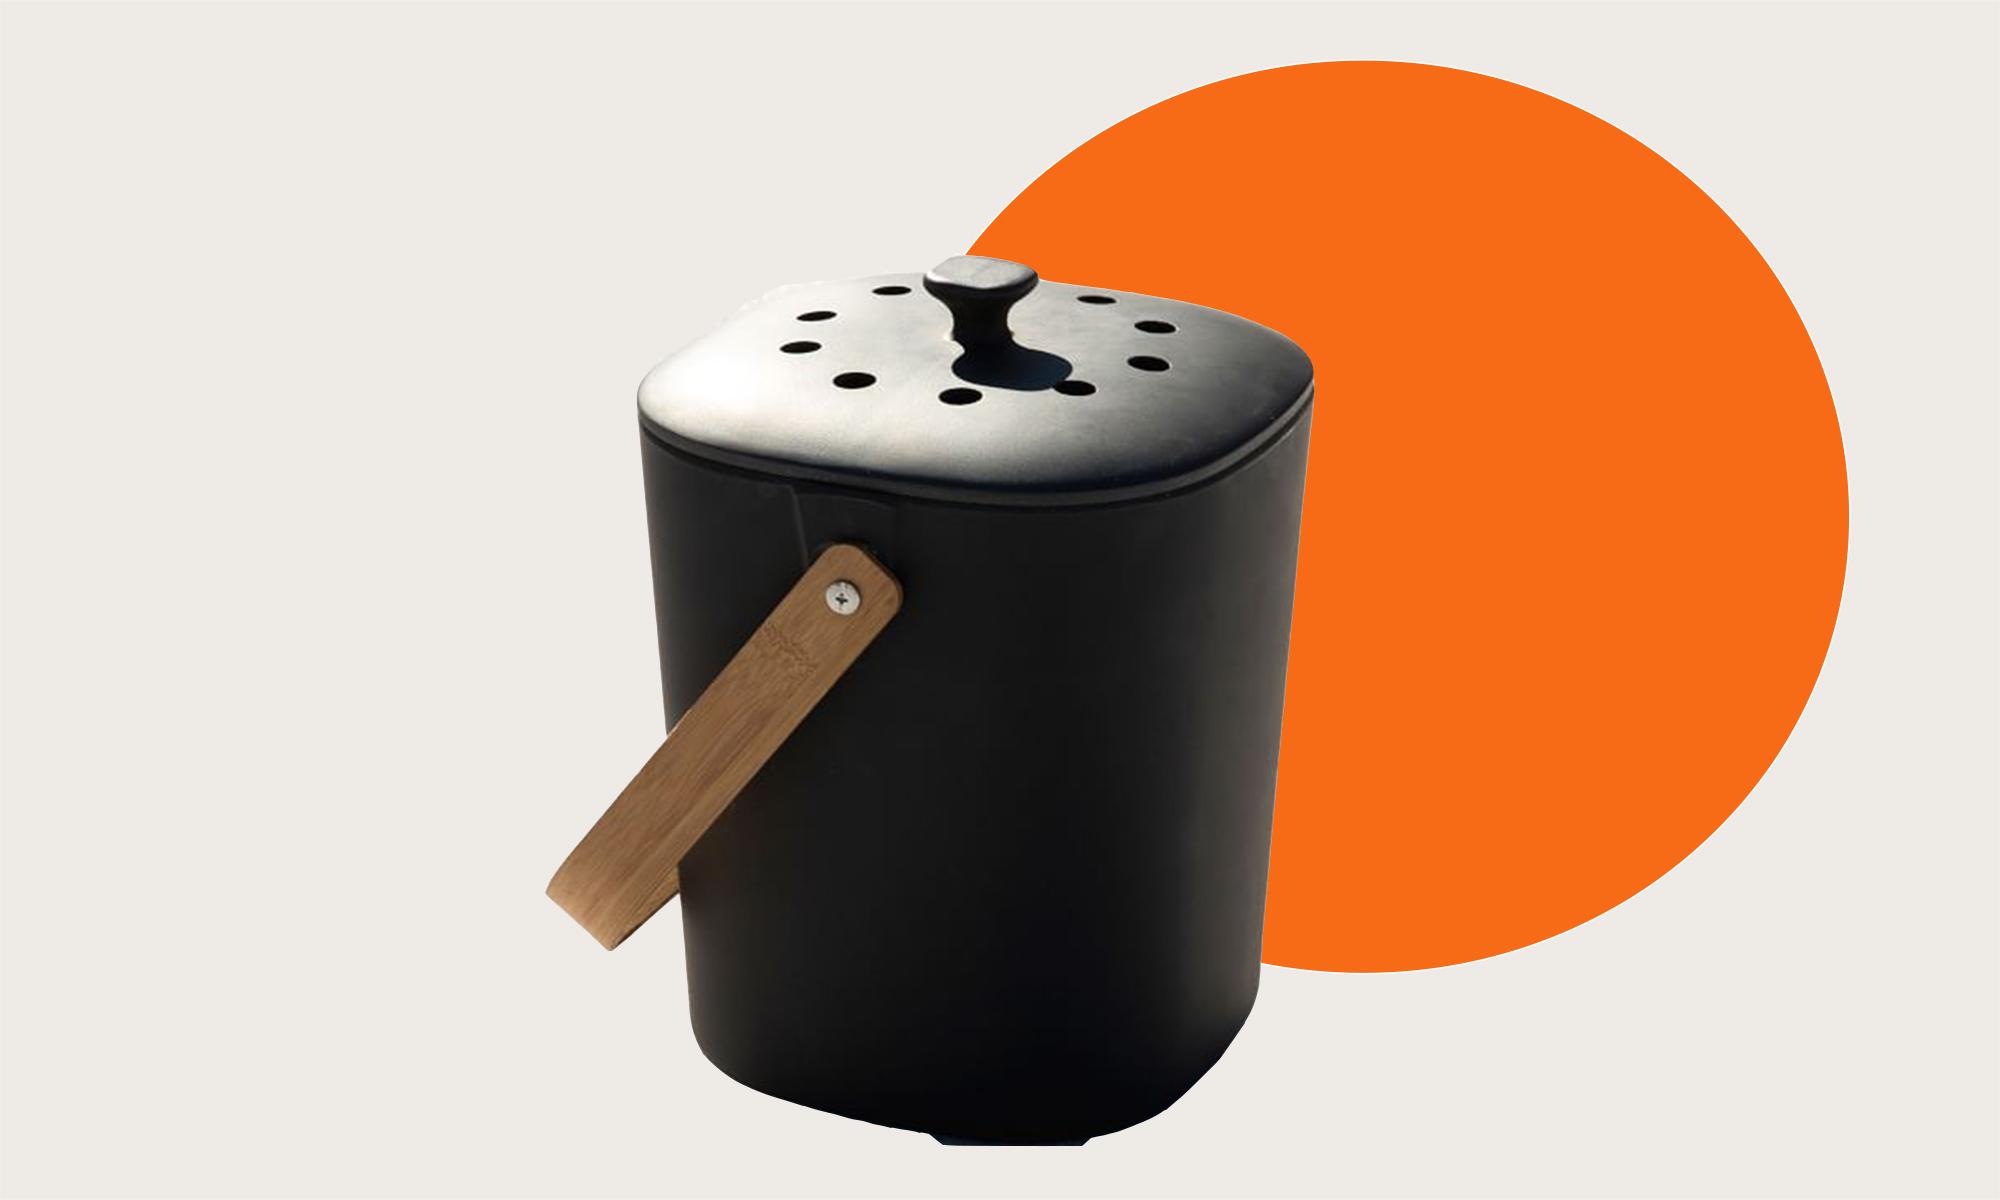 A black compost bin